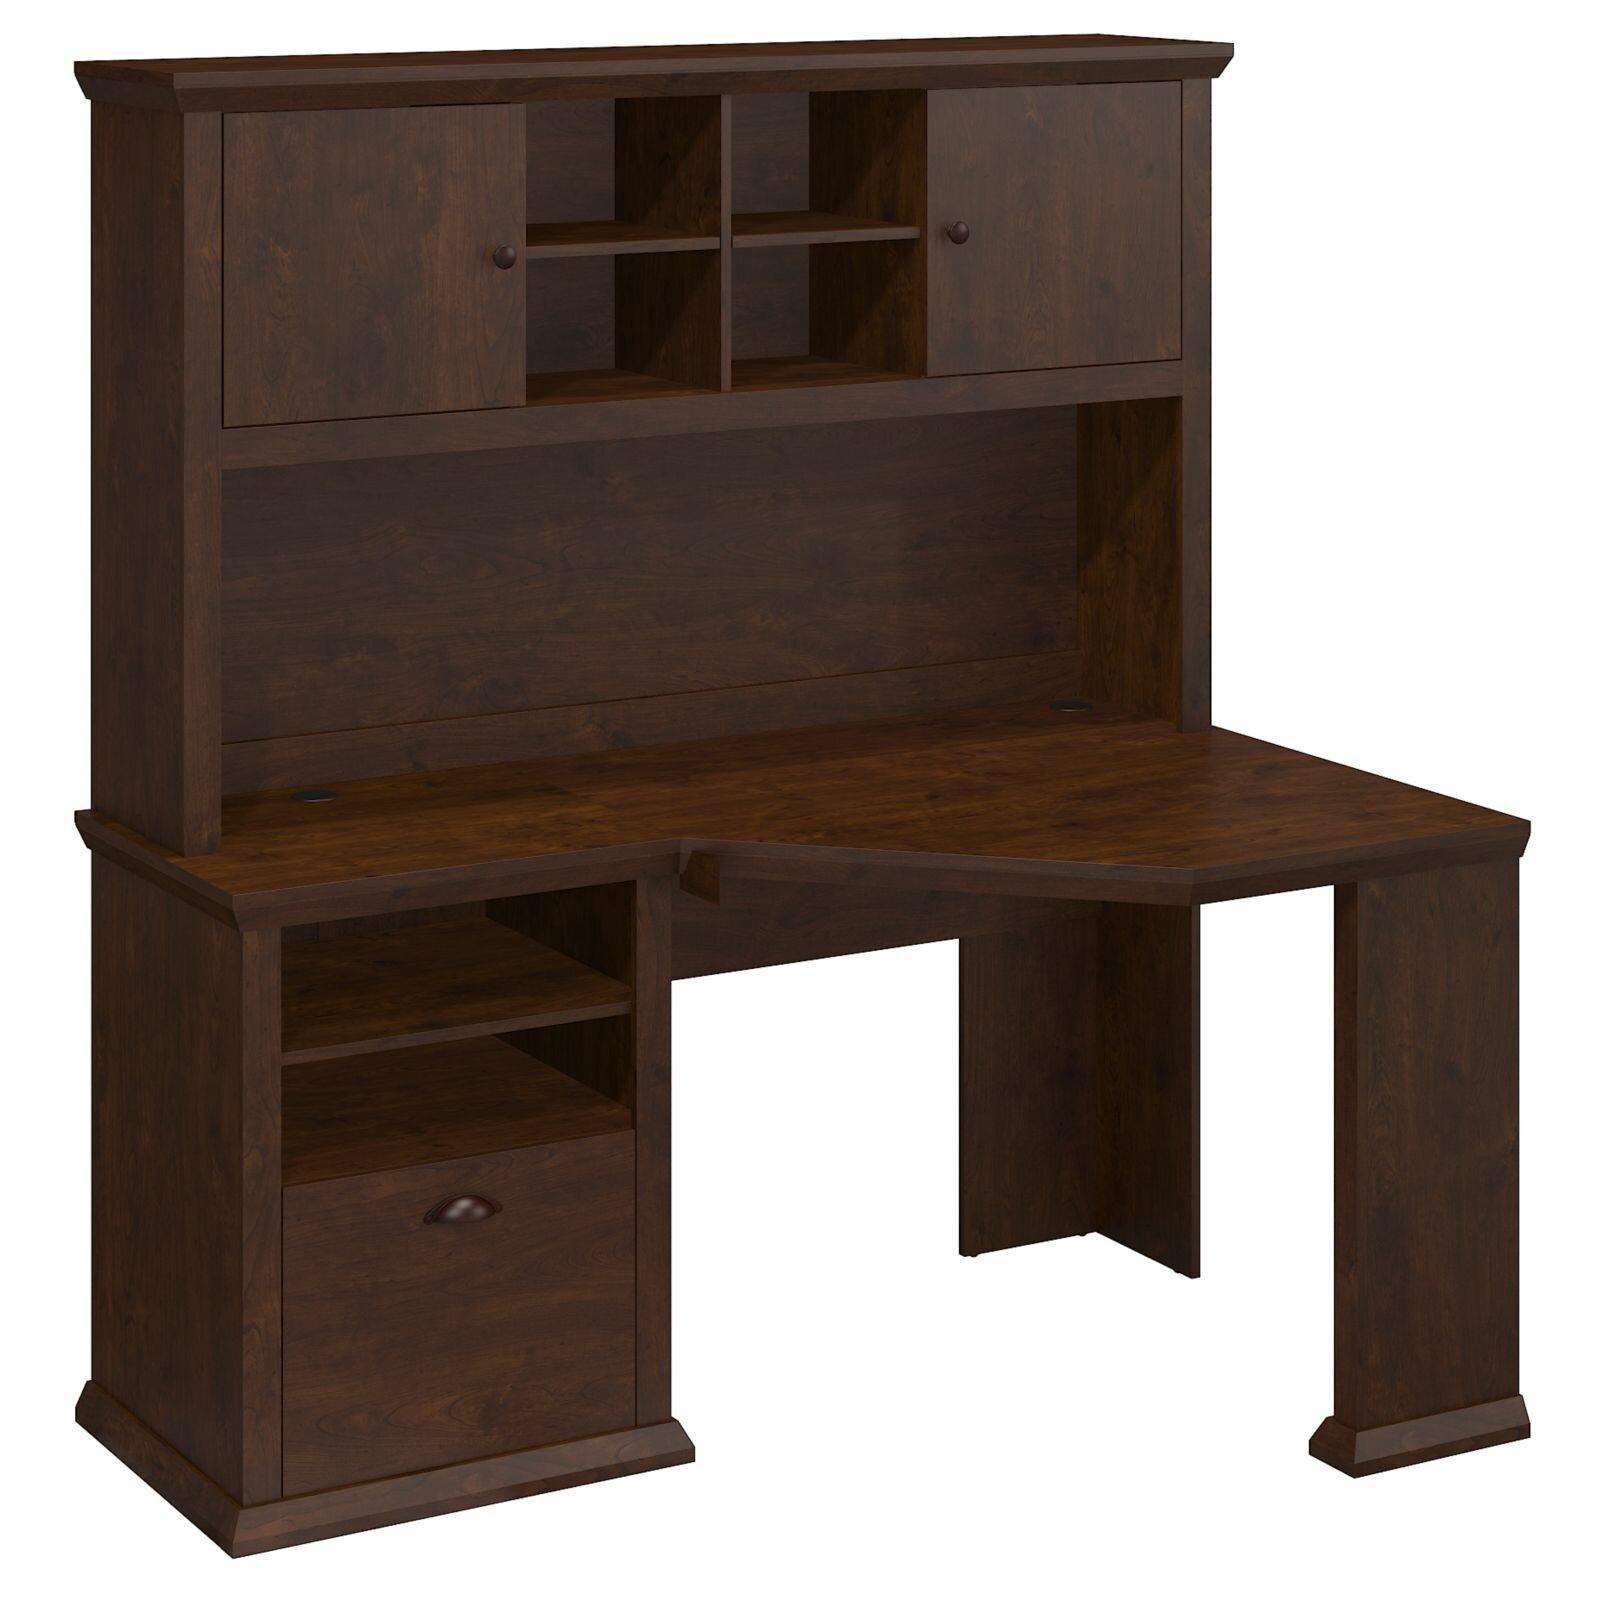 Bush furniture yorktown corner desk and hutch reviews for Bush furniture